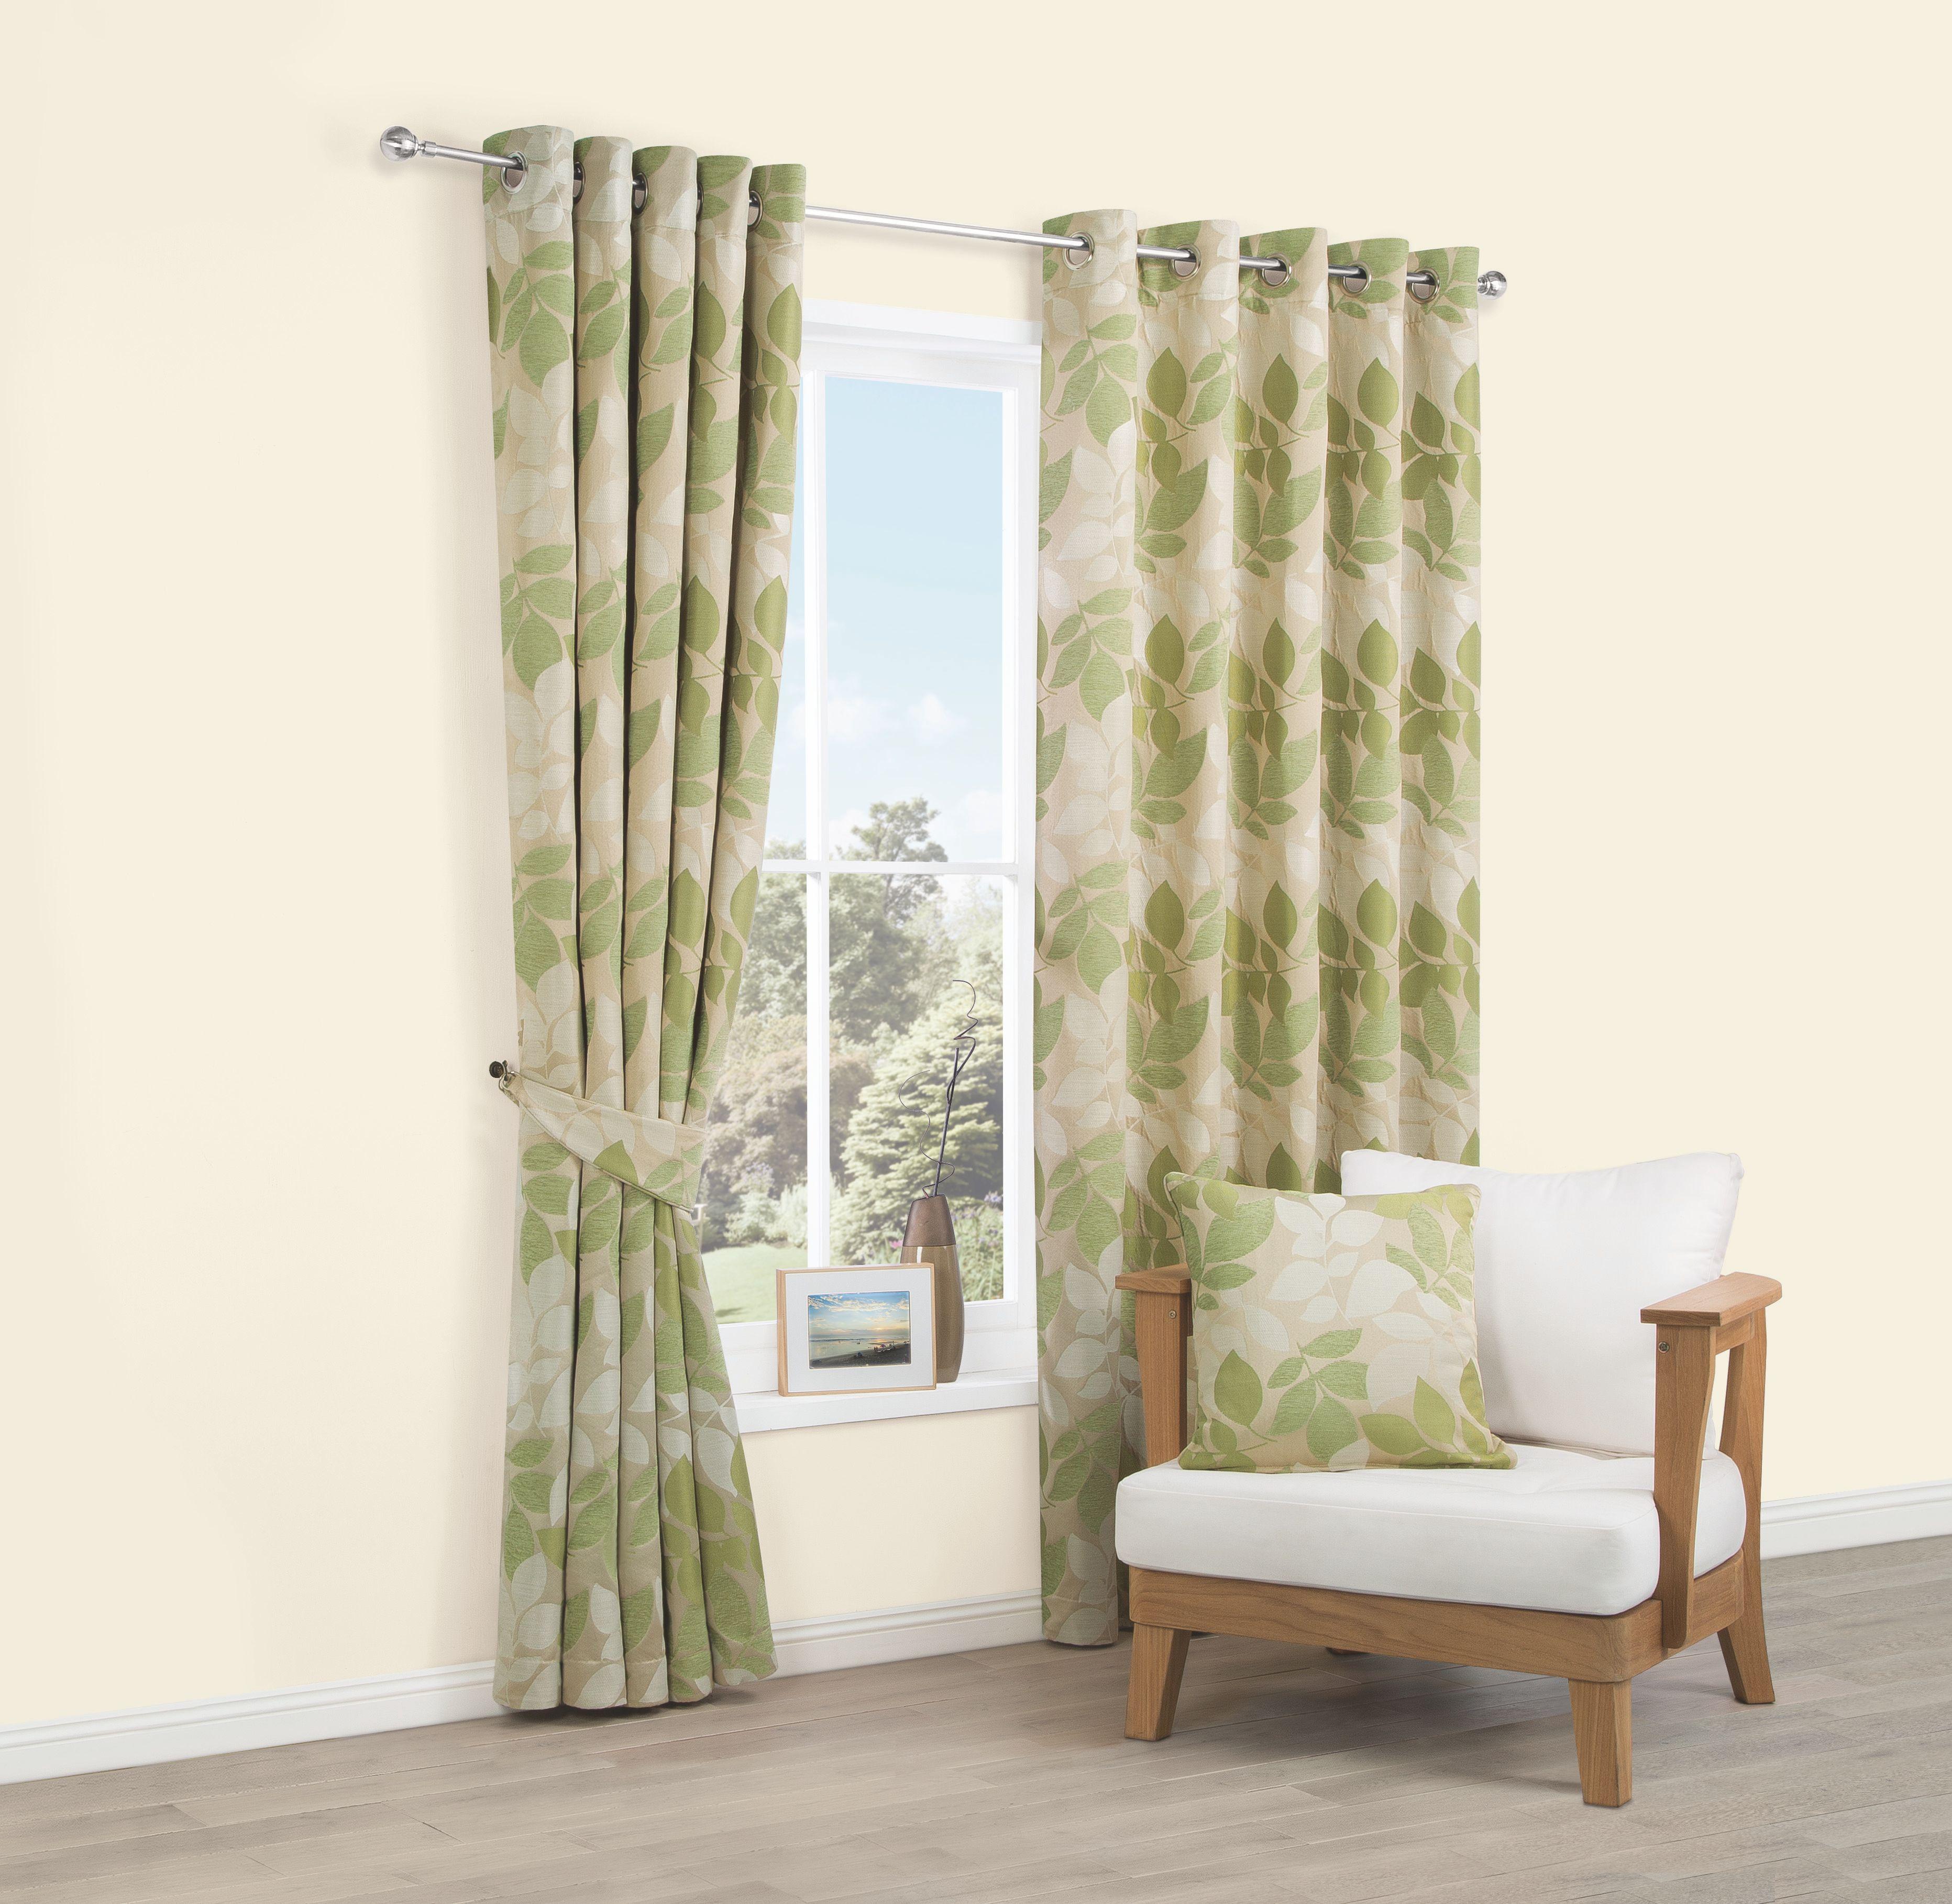 Araxa Citrus Green Leaves Woven Eyelet Lined Curtains (W)117 cm (L)137 cm |  Departments | DIY at B&Q